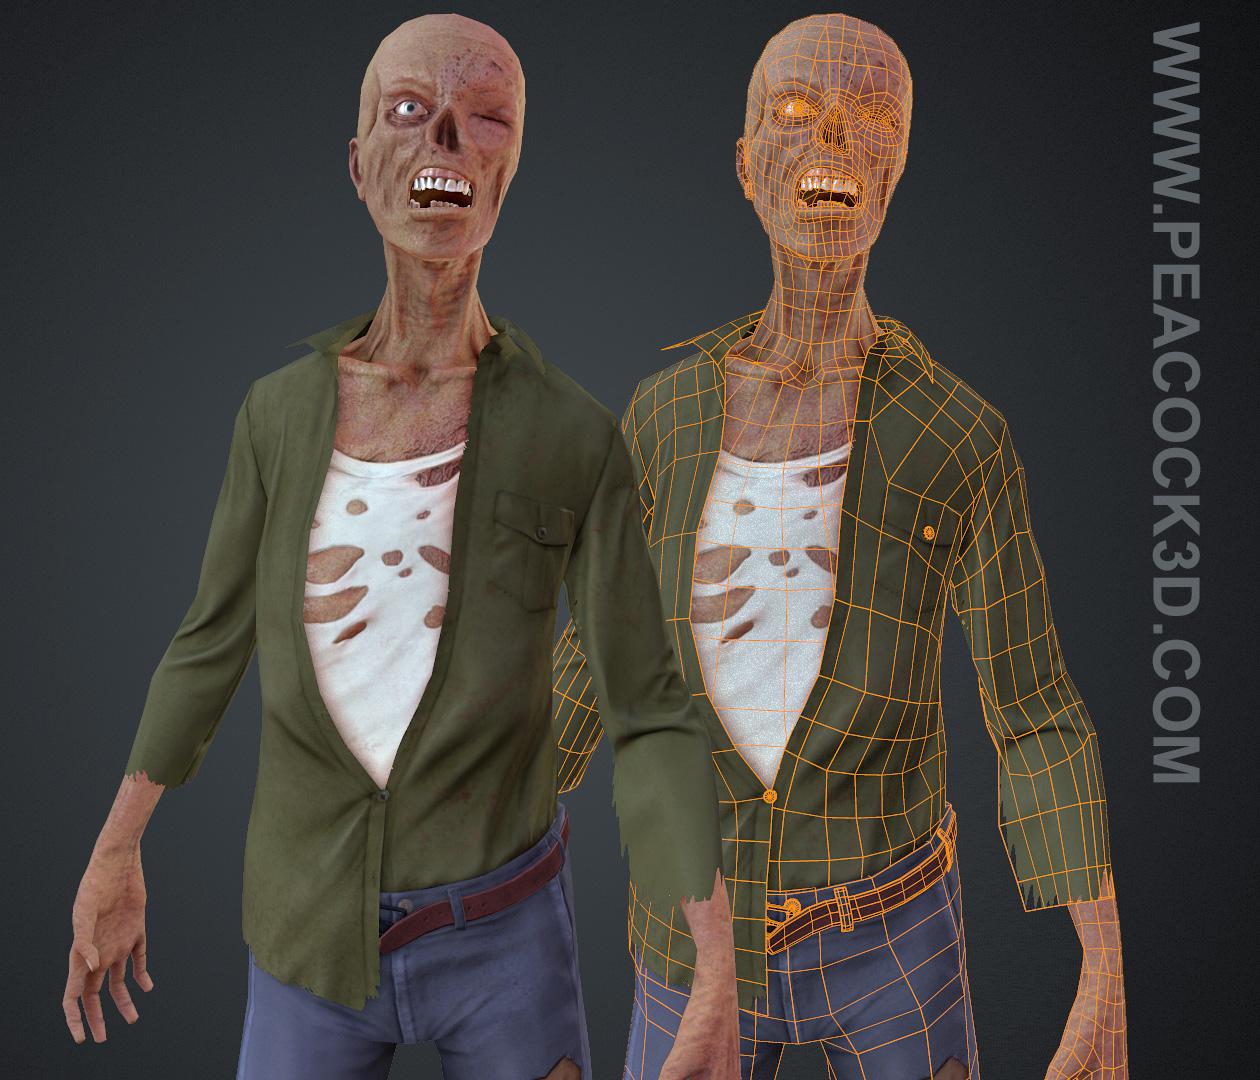 Low Poly Zombie, 3D Zombie, Videogame art, Videogame Zombie, 3D Artist, Jason Peacock, Peacock3d, Marmoset Toolbag, ZBrush, Maya, Low Poly, Low Poly Artist, 3D Modeler